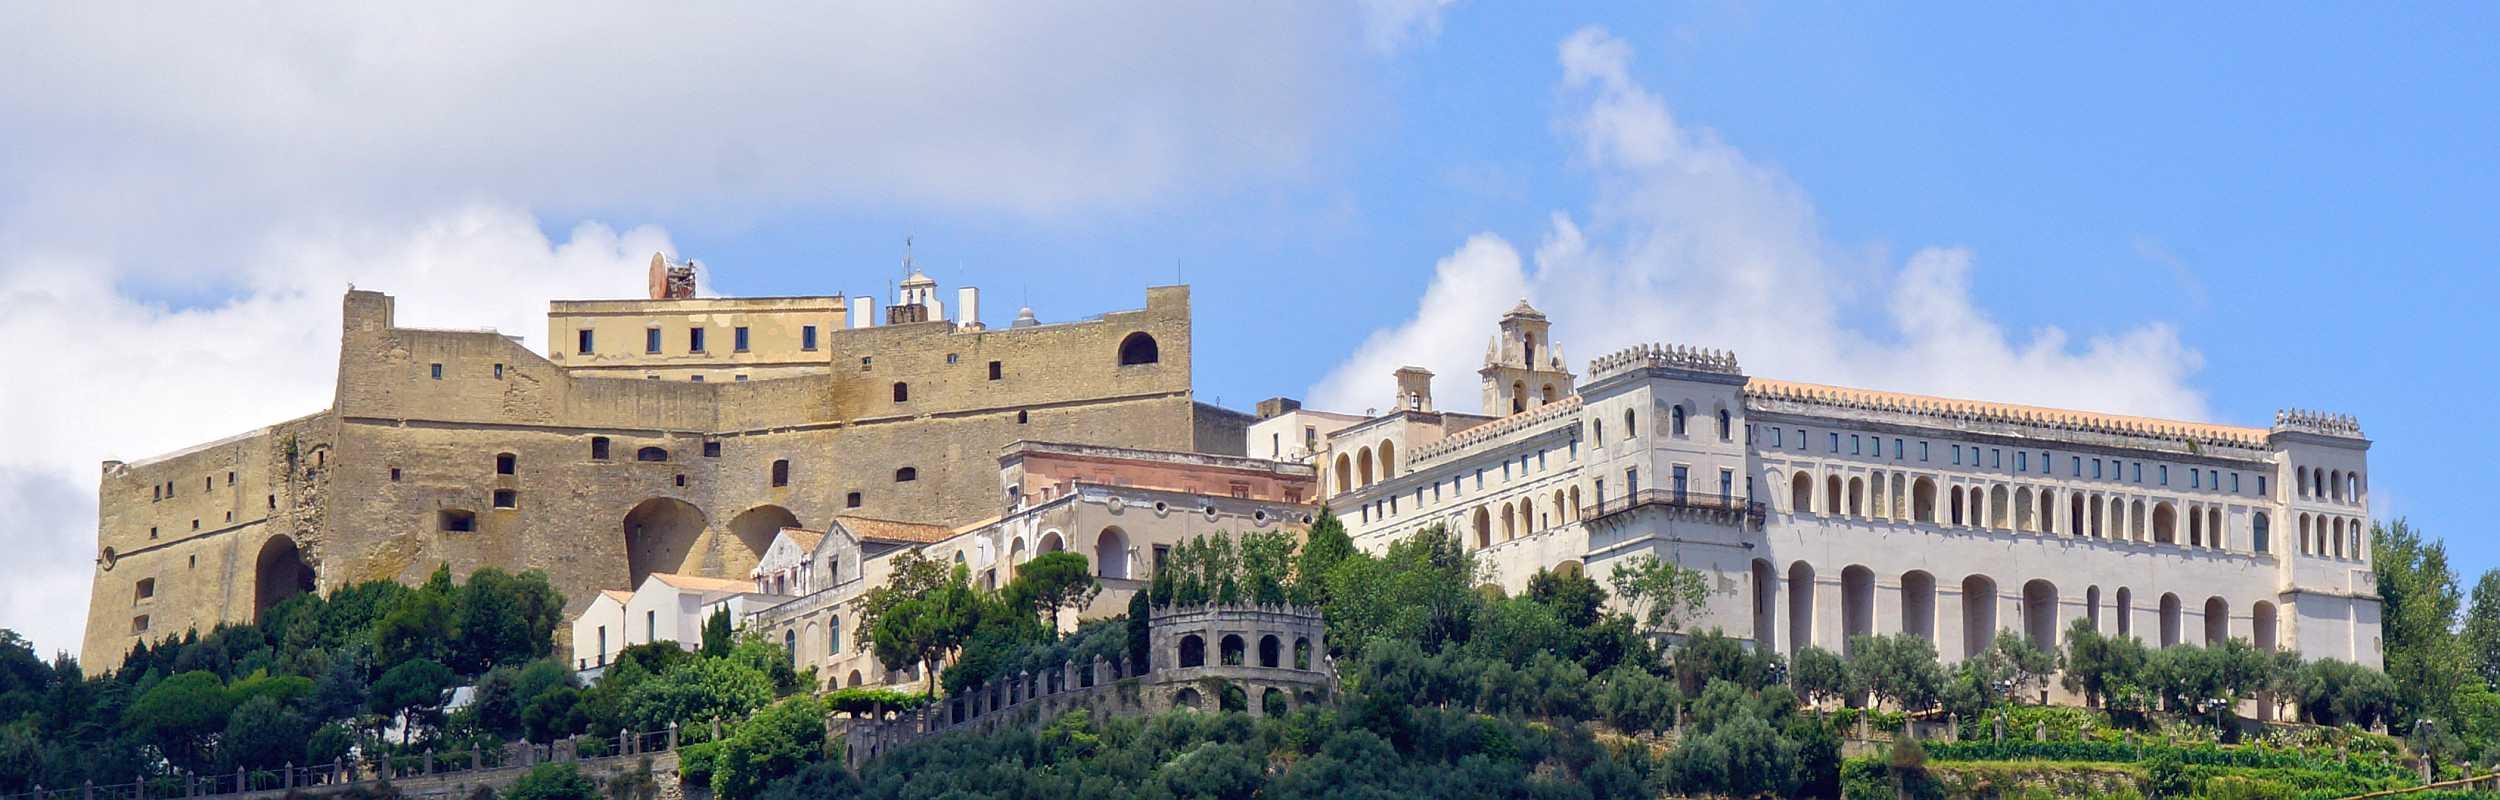 Napolicittàlibro a Castel Sant'Elmo